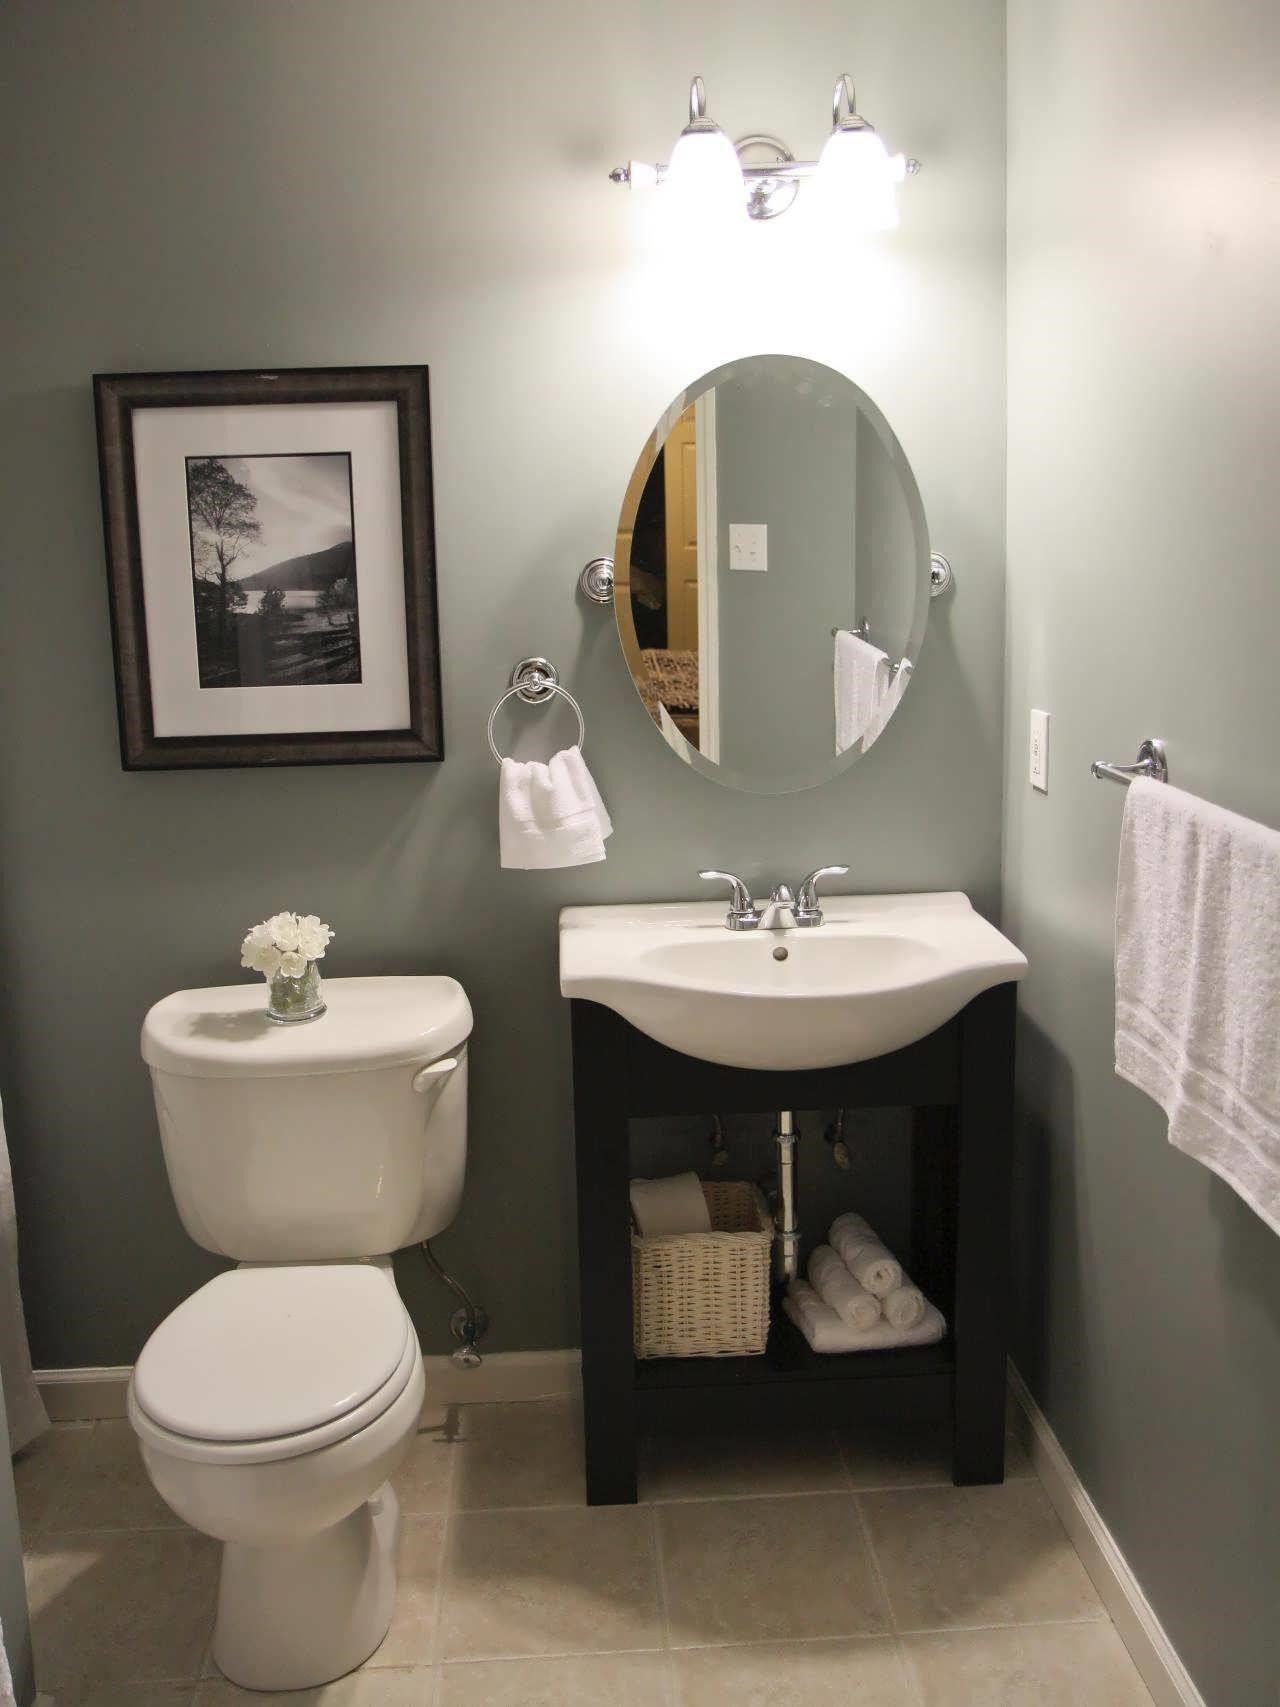 Pin By Isaiah Johnson On Bath Half Bathroom Decor Guest Bathroom Small Small Bathroom Ideas On A Budget Half bathroom design ideas